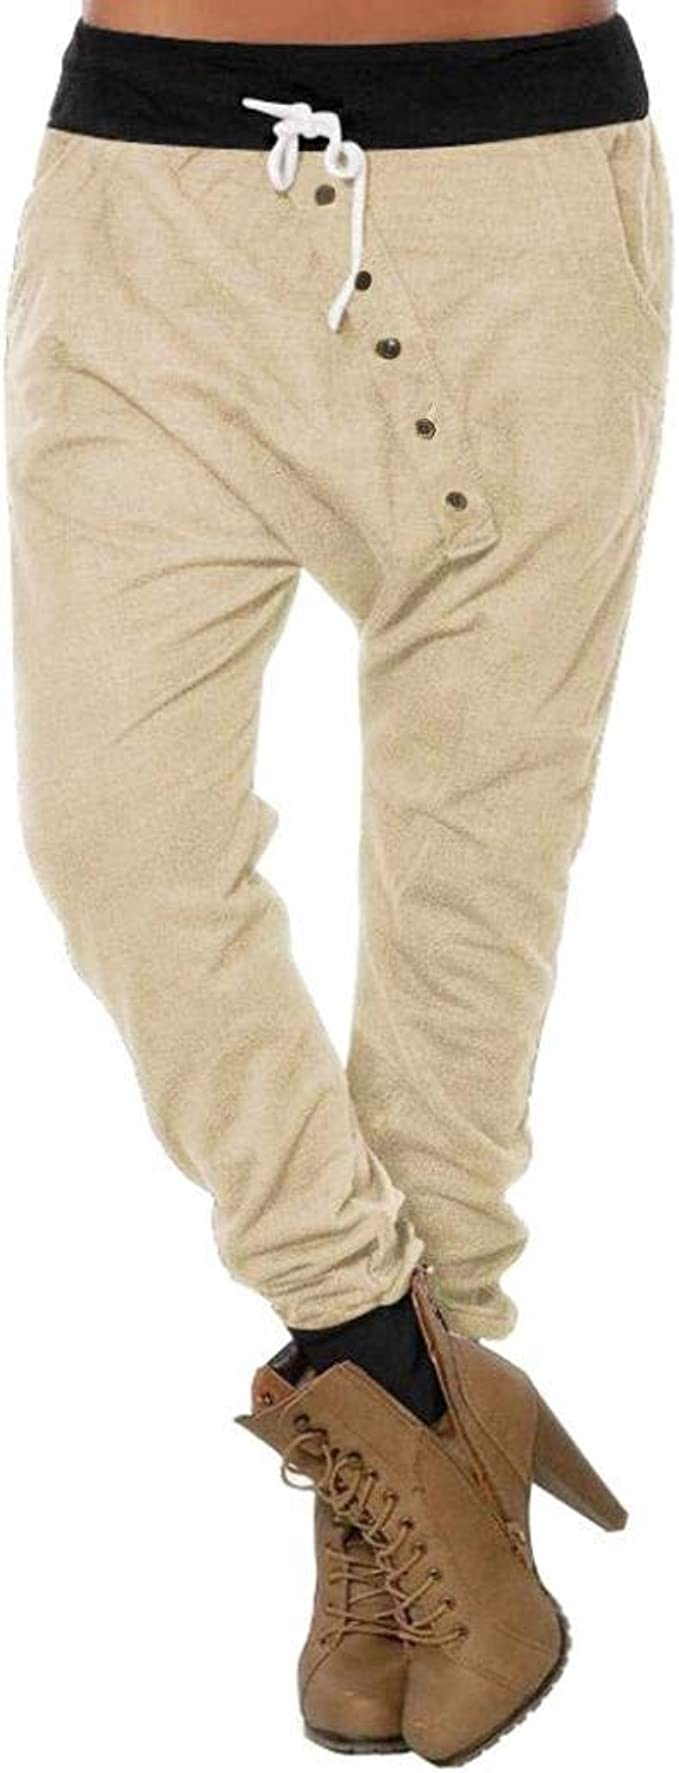 Pantalón De Chándal para Pantalón De Mujer Chándal Pantalones ...